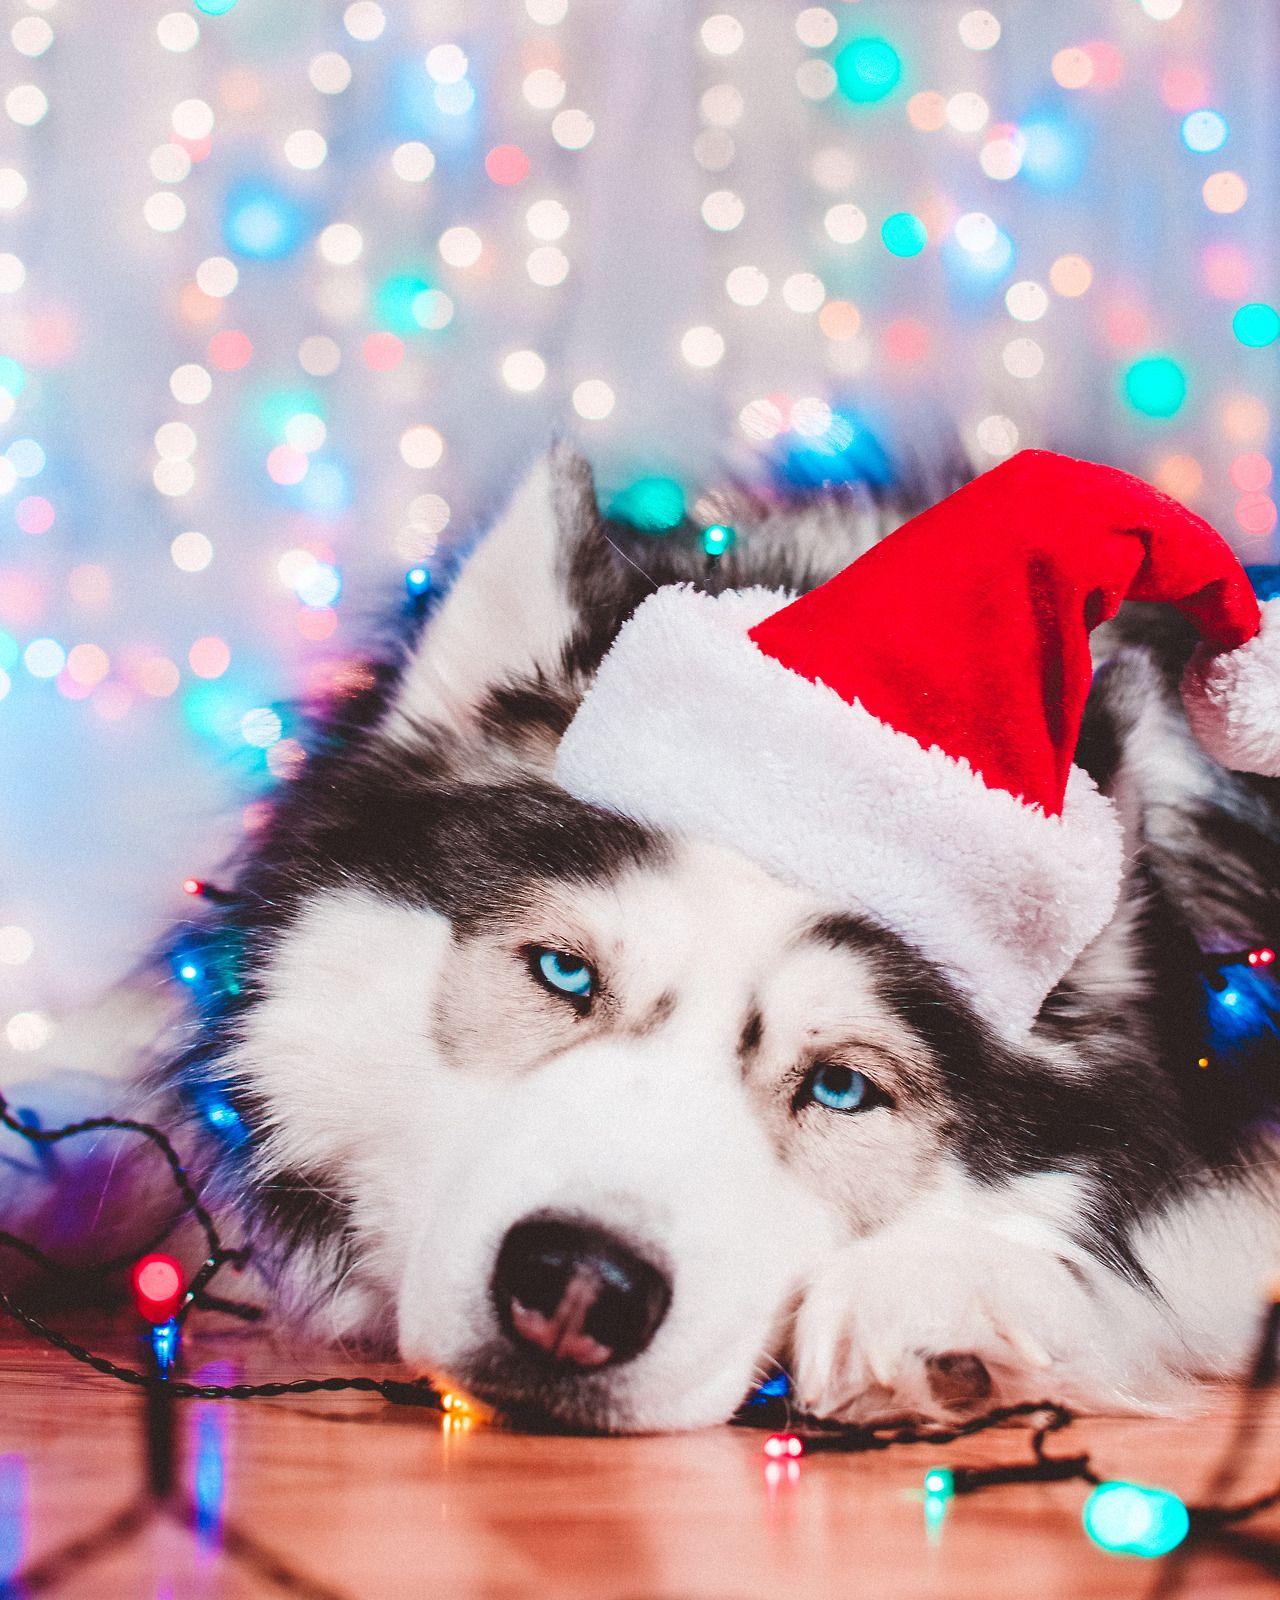 Siberian Husky Christmas Husky Puppy Alaskan Husky Husky Dogs